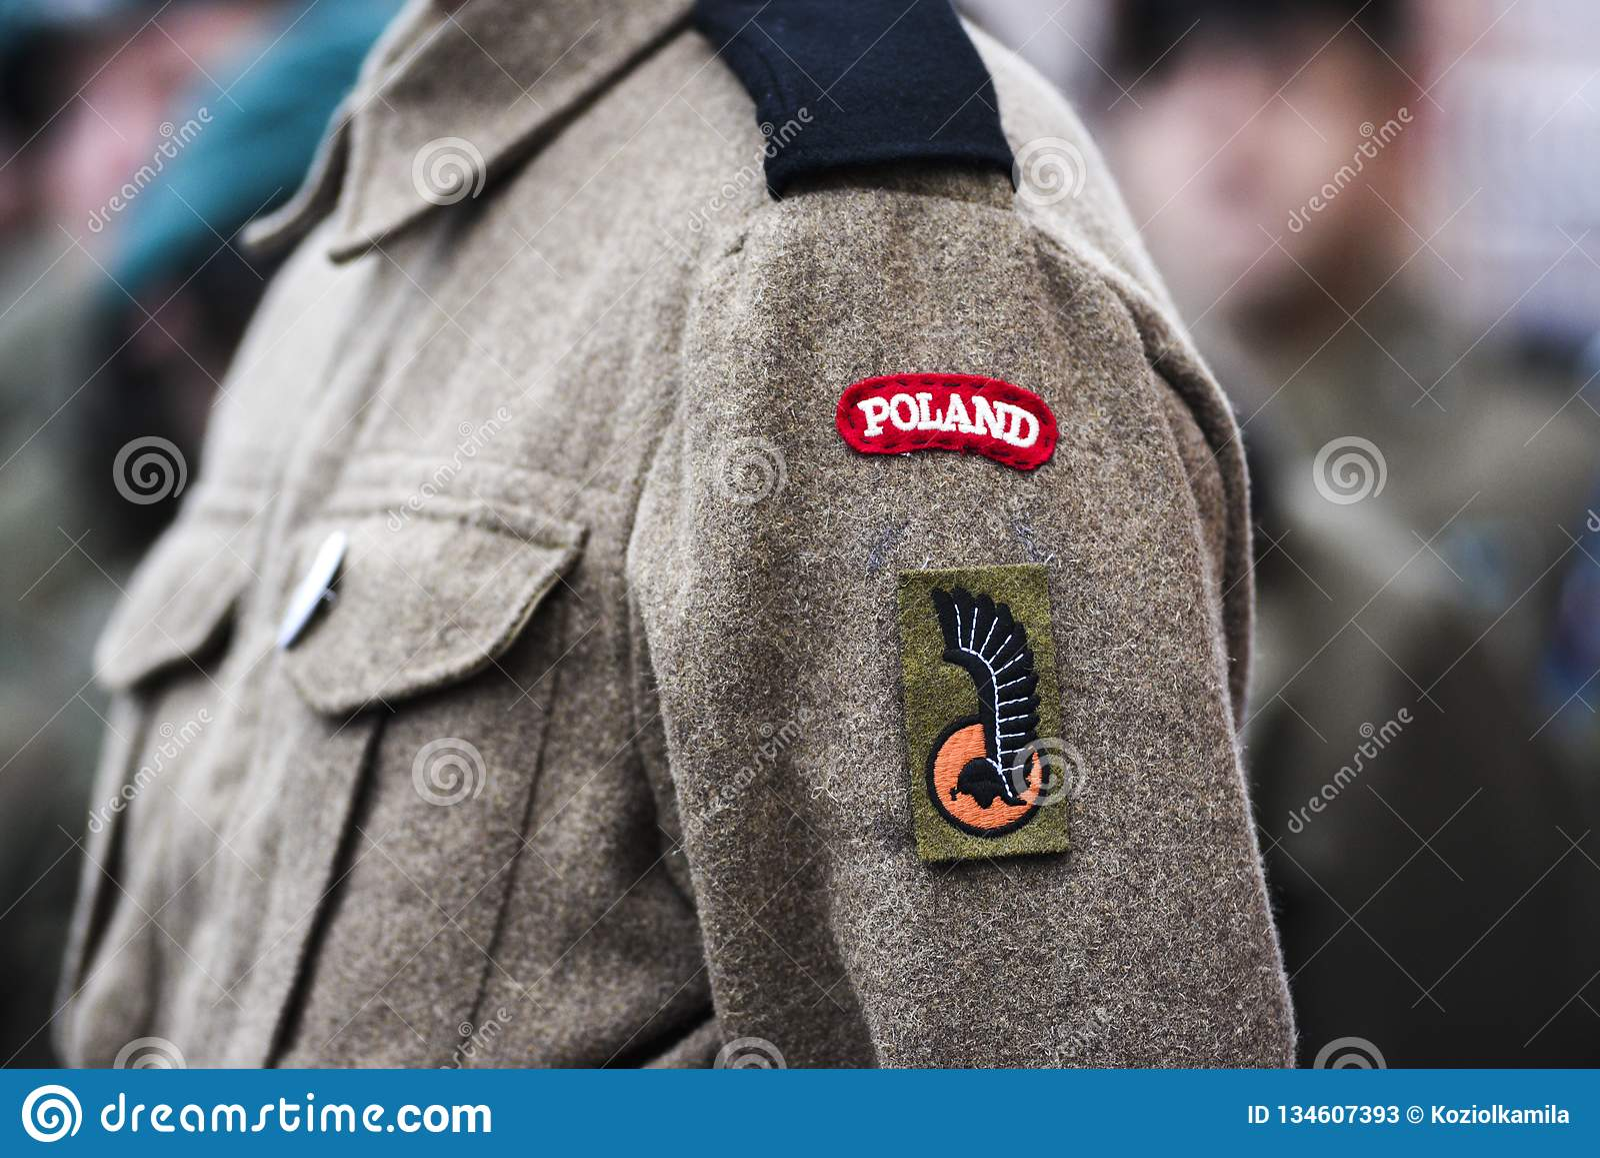 Un paracaidista polaco de la Segunda Guerra Mundial, un remiendo en un uniforme militar, un emblema polaco